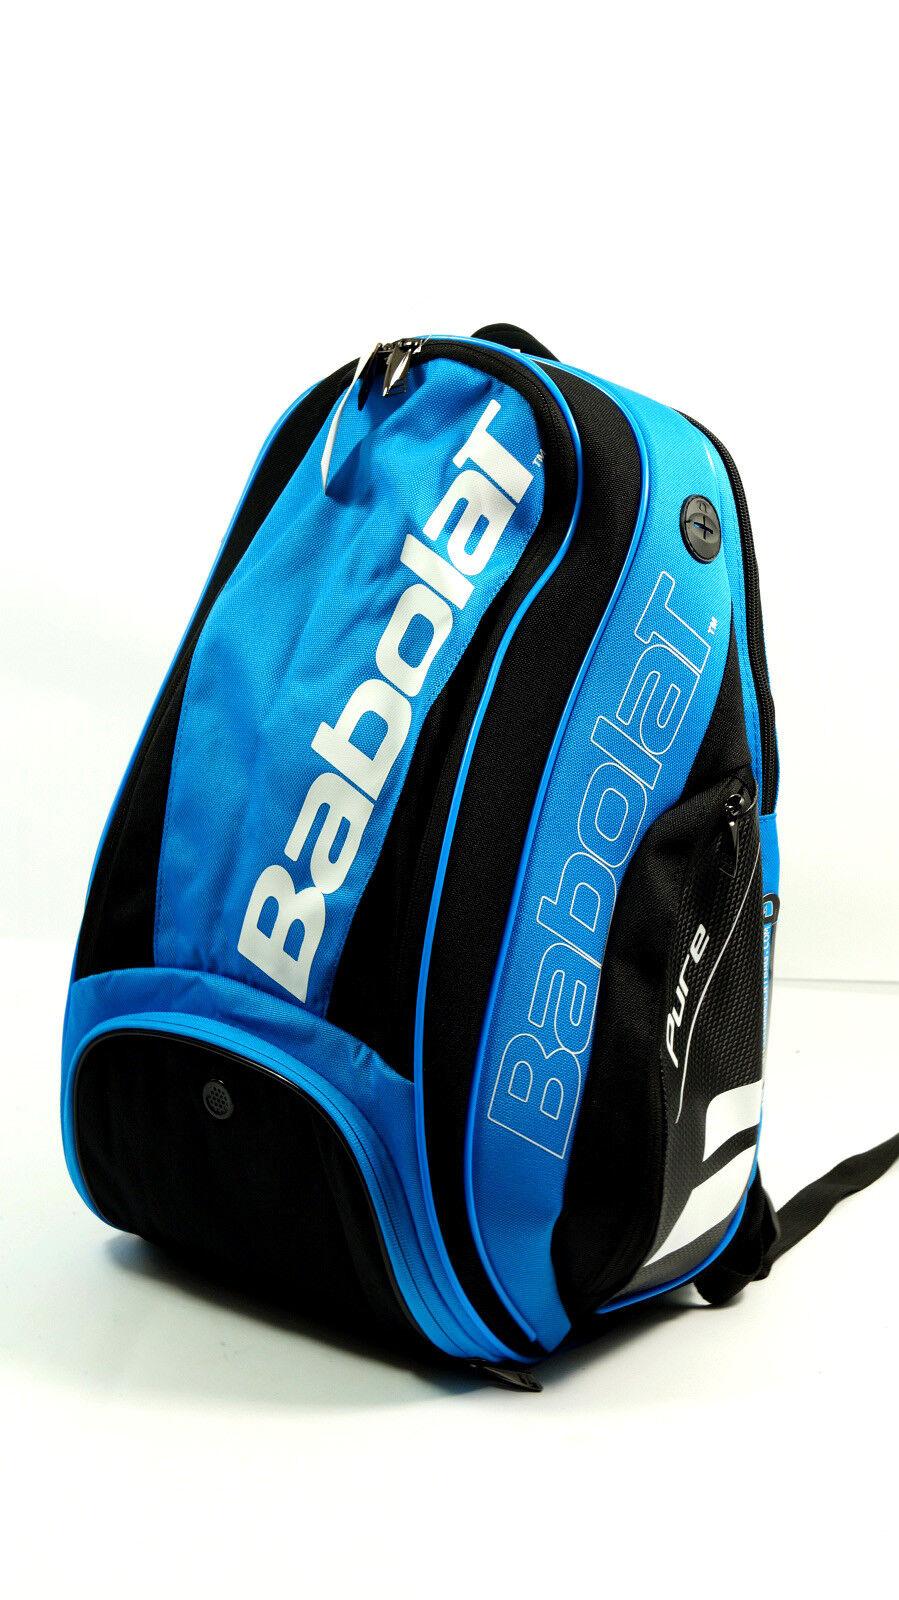 NEUBabolat Pure Drive Tennisrucksack Blau Schwarz Schwarz Schwarz racketbag Blau schwarz pro new 346799